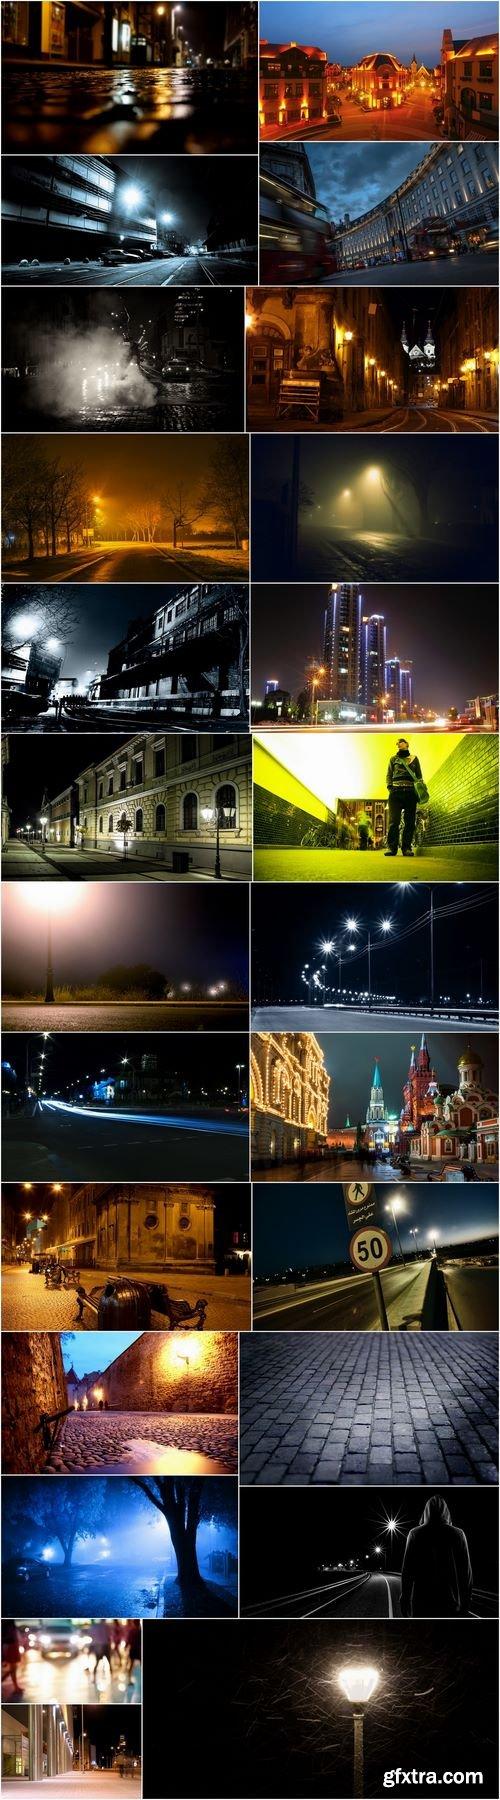 Night street lantern light area house road asphalt city 25 HQ Jpeg